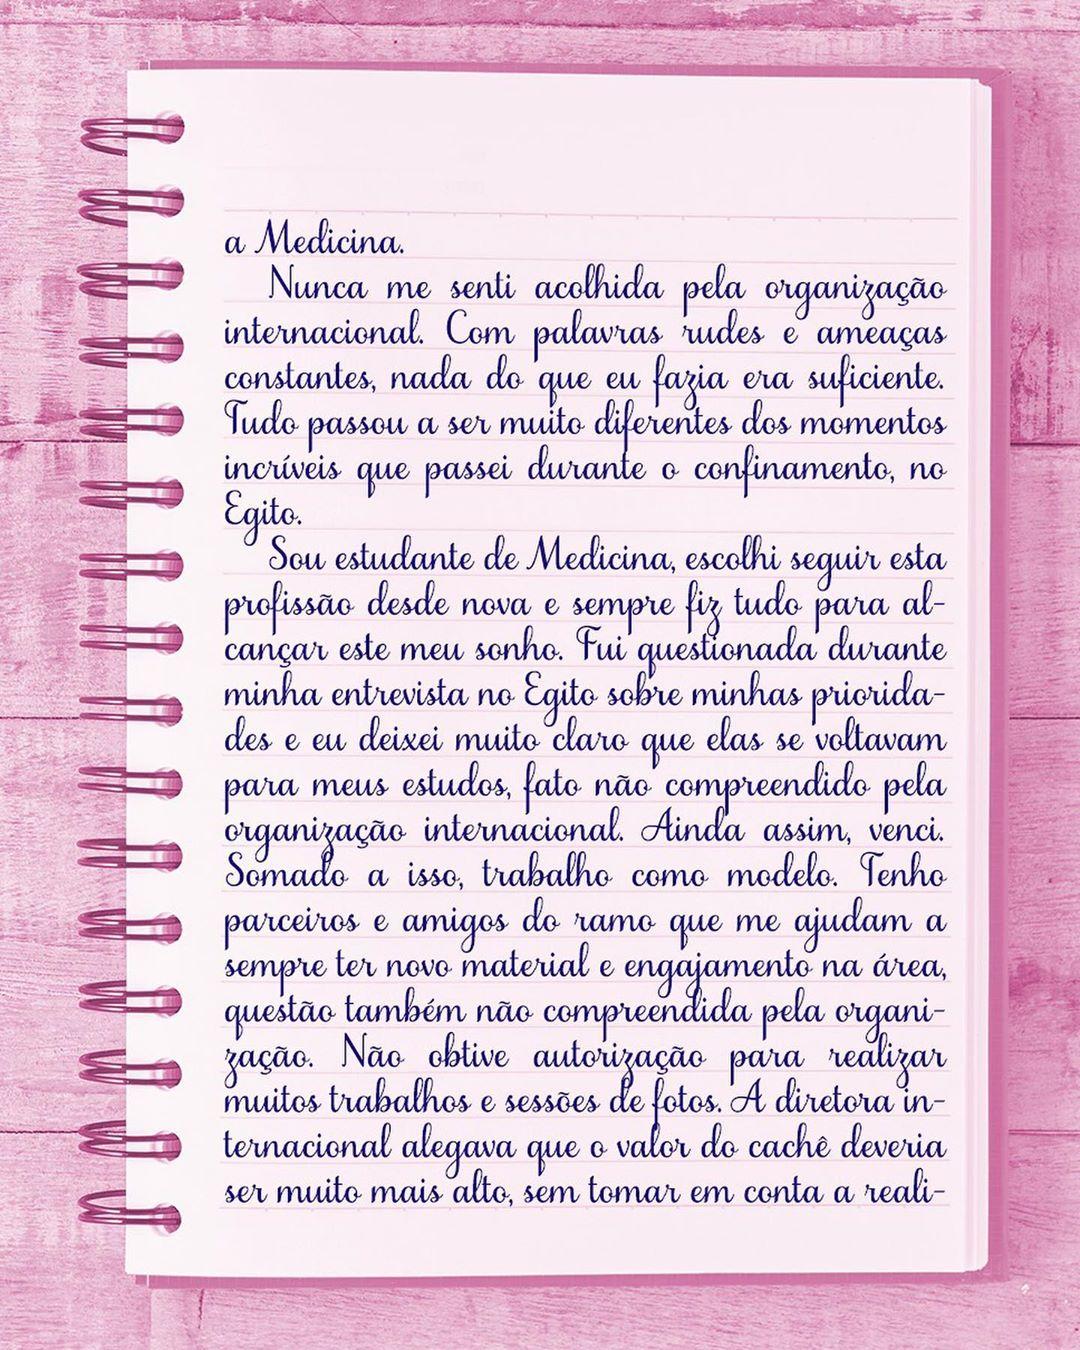 maria eduarda valotto, miss eco teen 2019. (renunciou). - Página 2 10928010